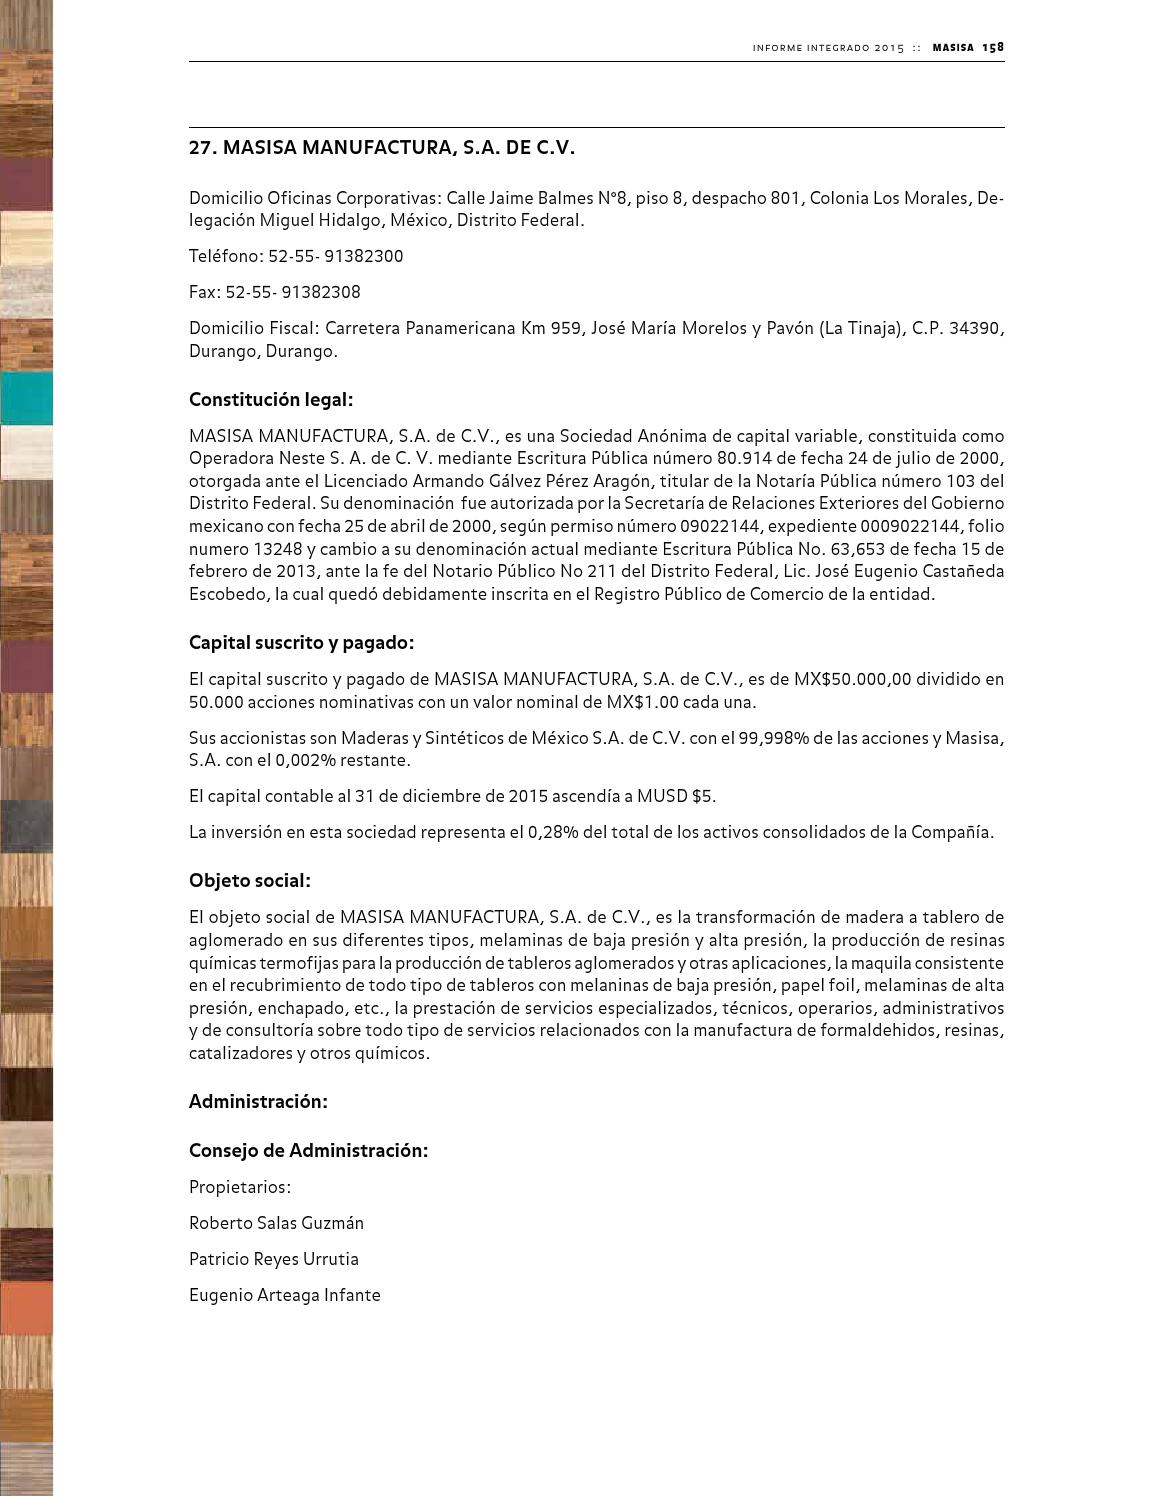 Antecedentes generales by memoria masisa 2015 page 79 issuu - Piso on durango telefono ...